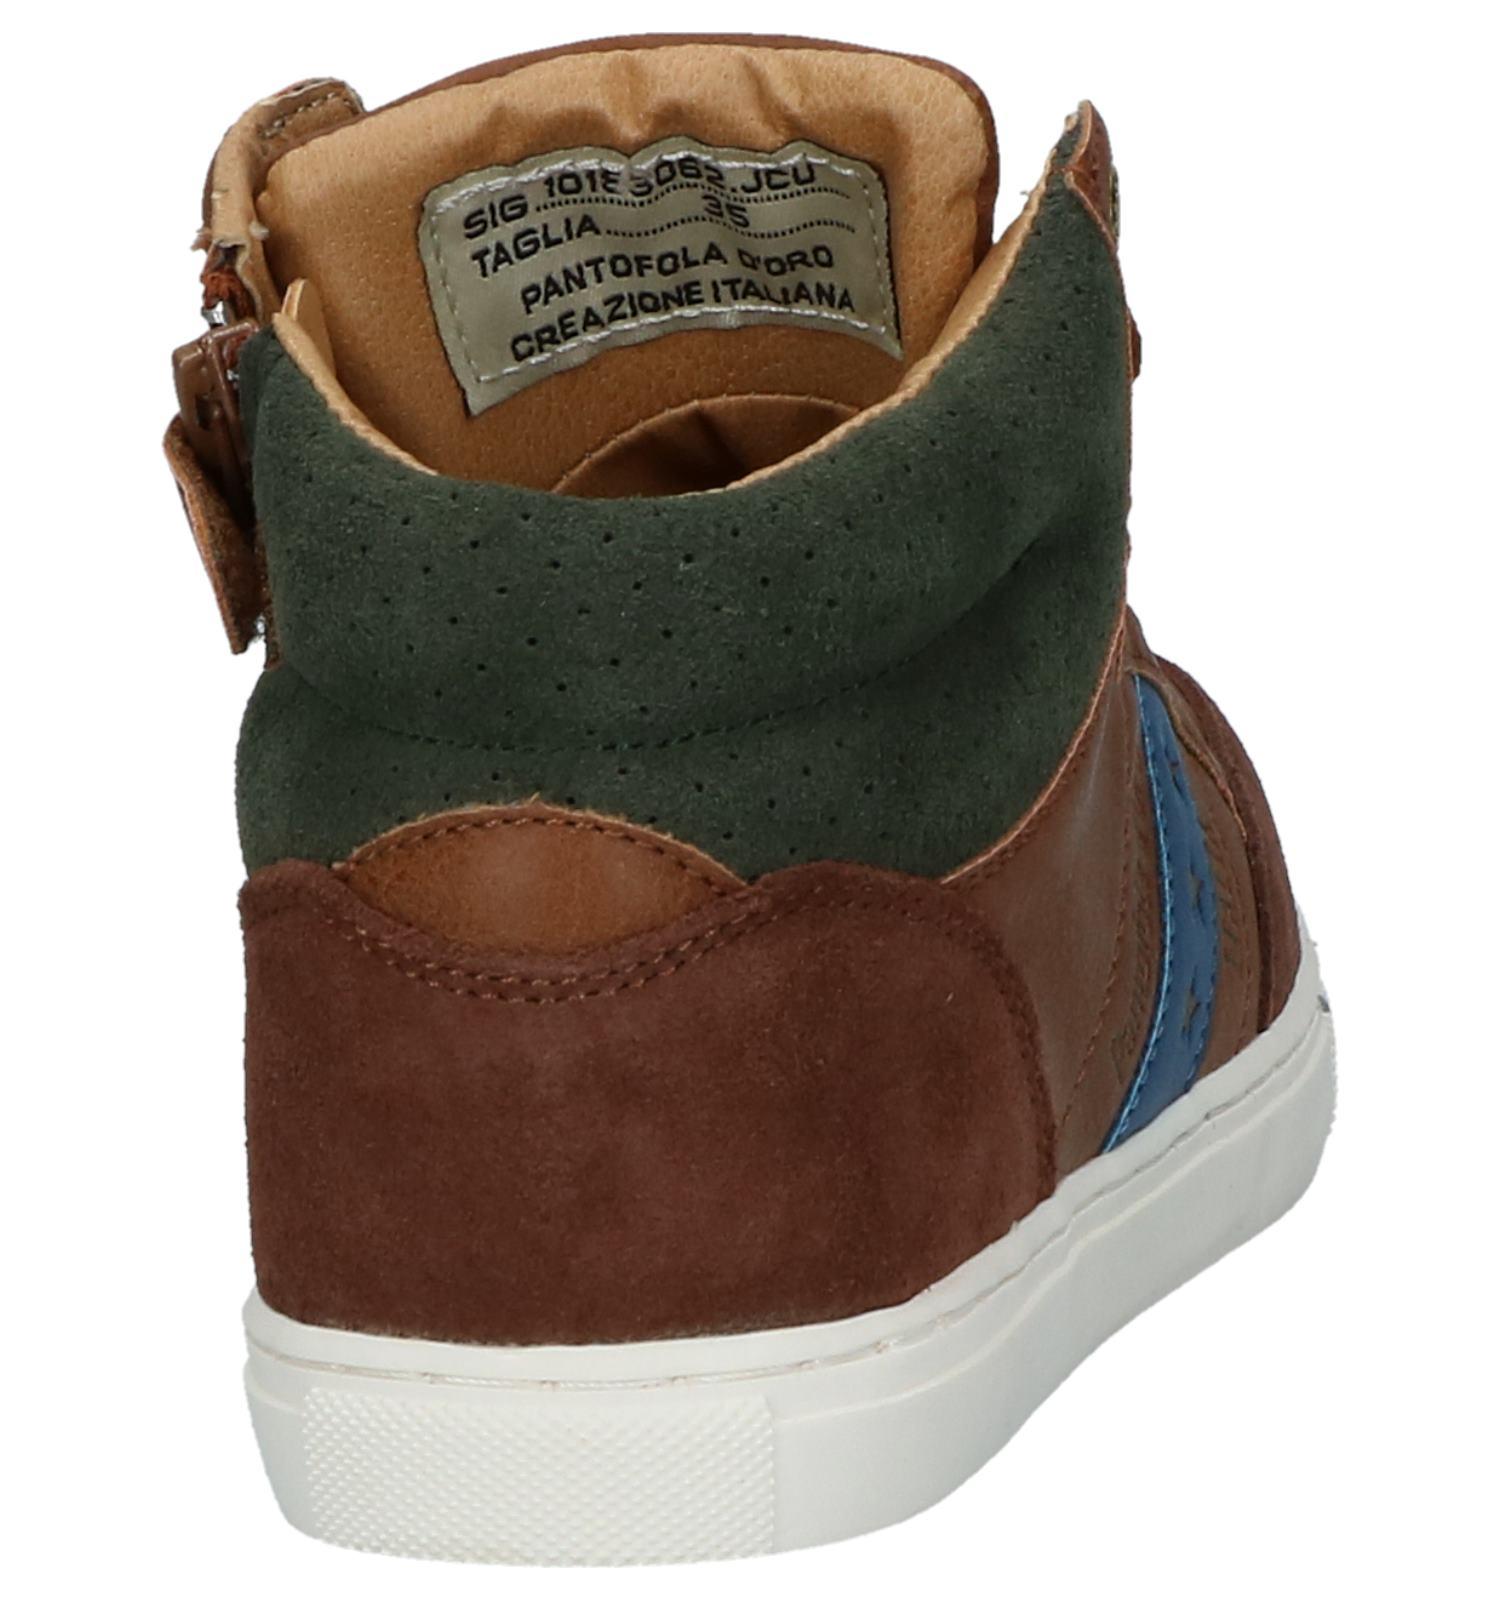 Hoge Sneakers Cognac D'oro Gagazzi Pantofola be Torfs Monza cxwq8cHpU4